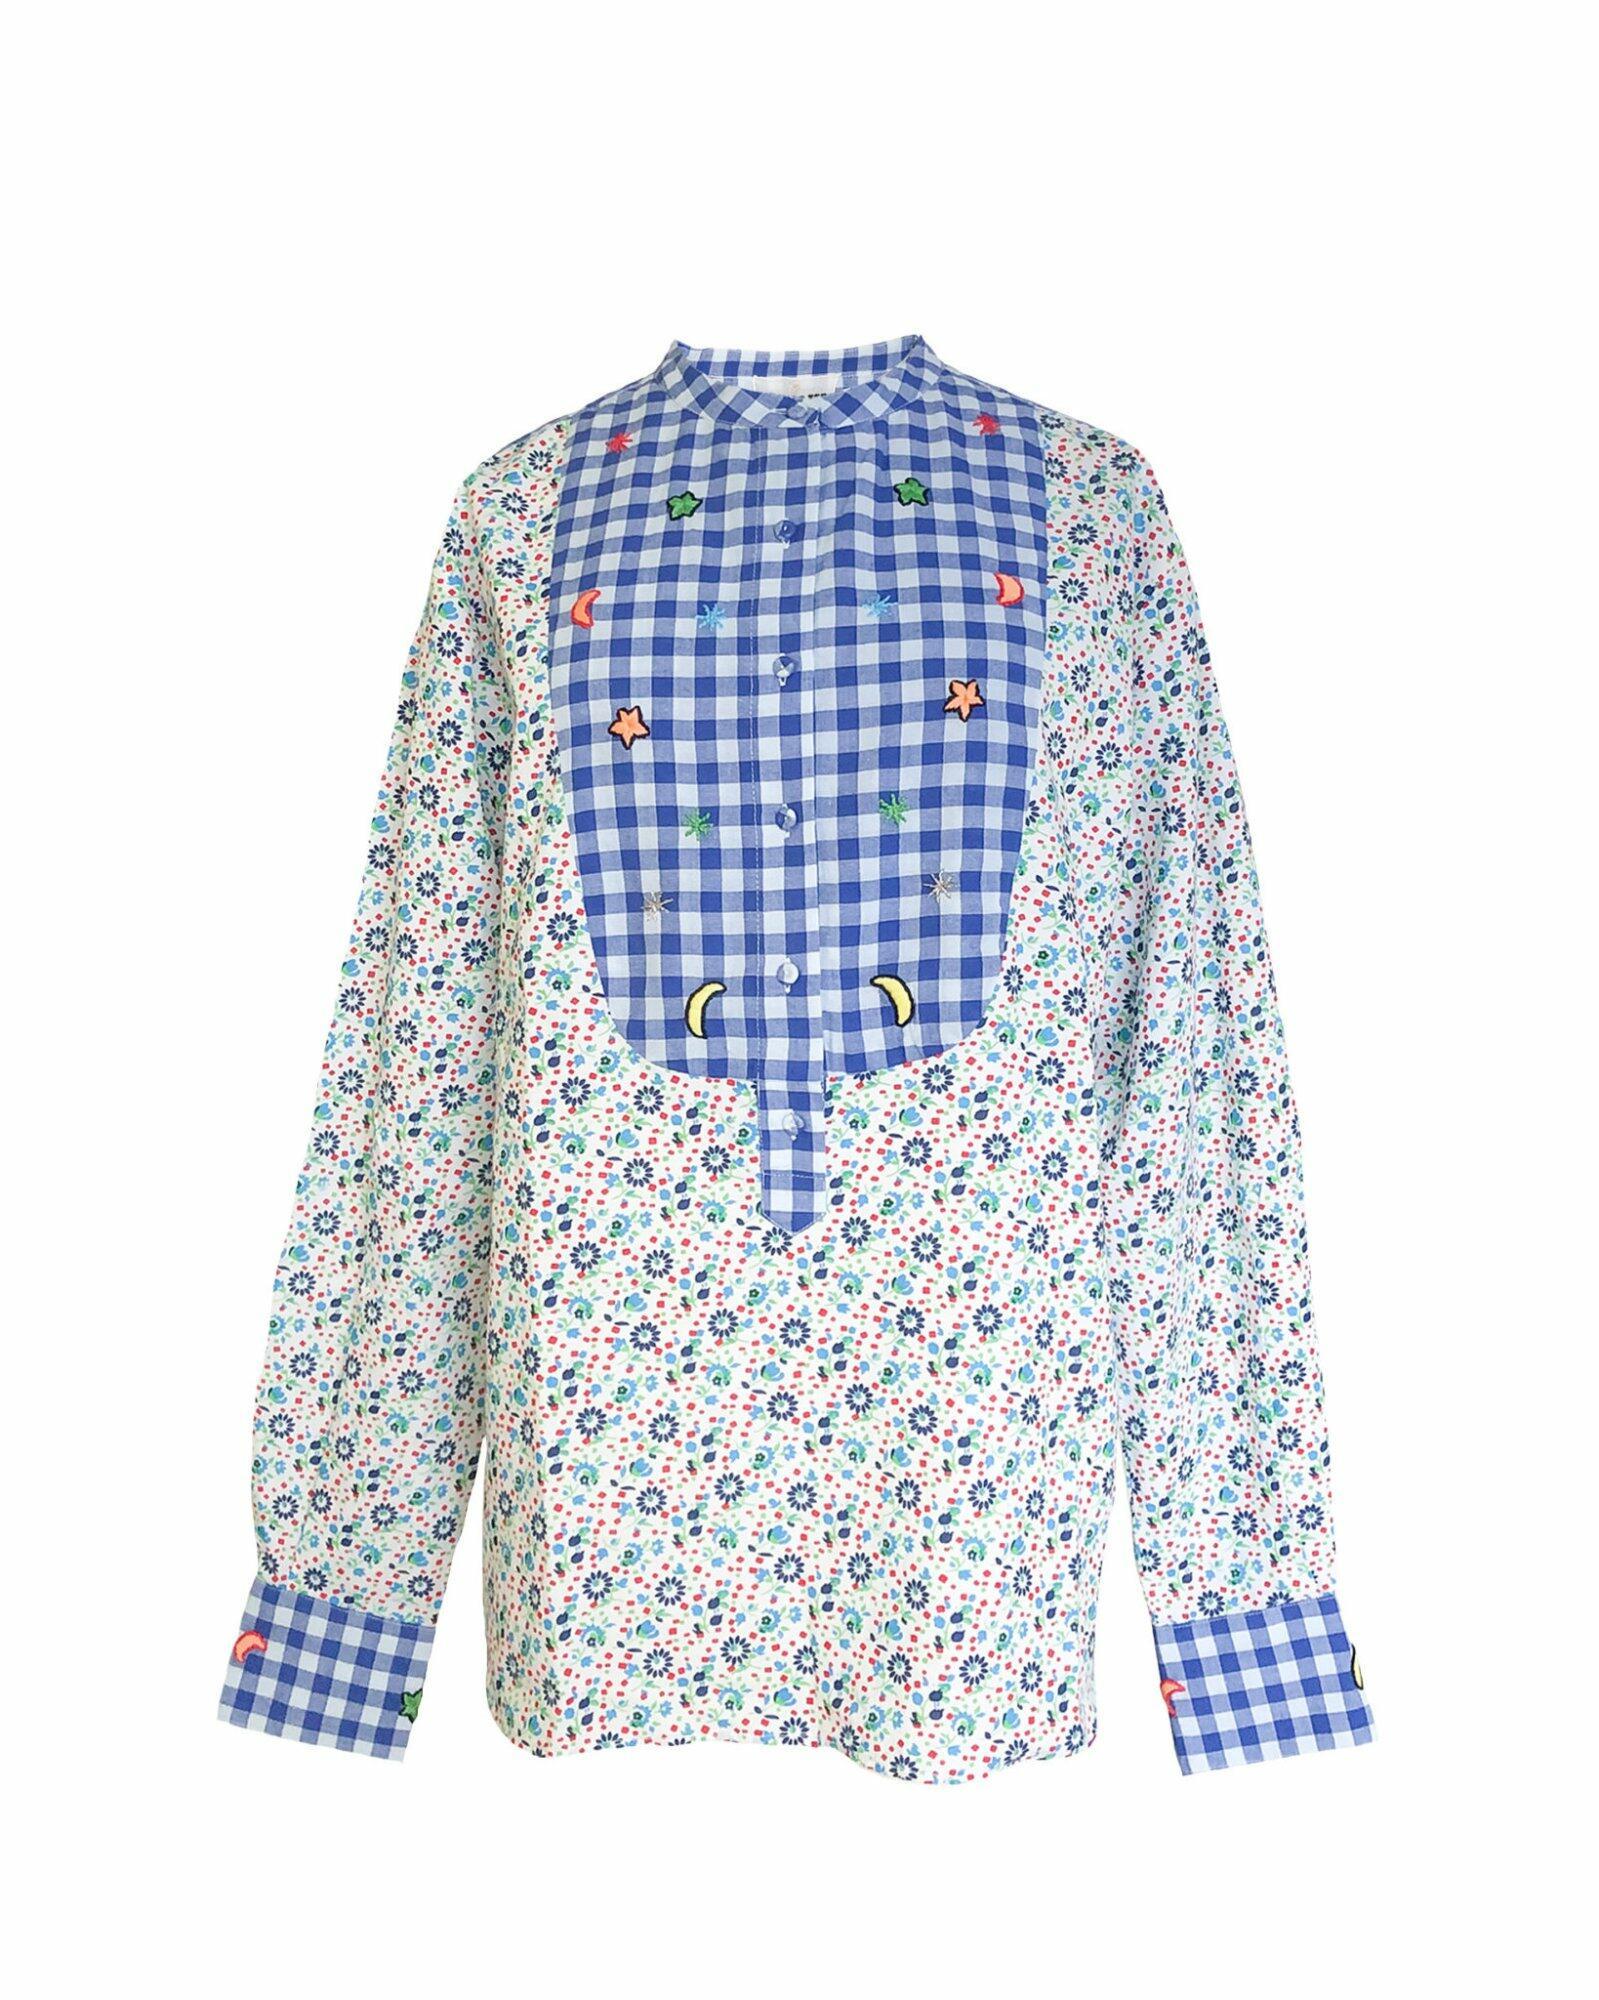 Vichy Floral Shirt